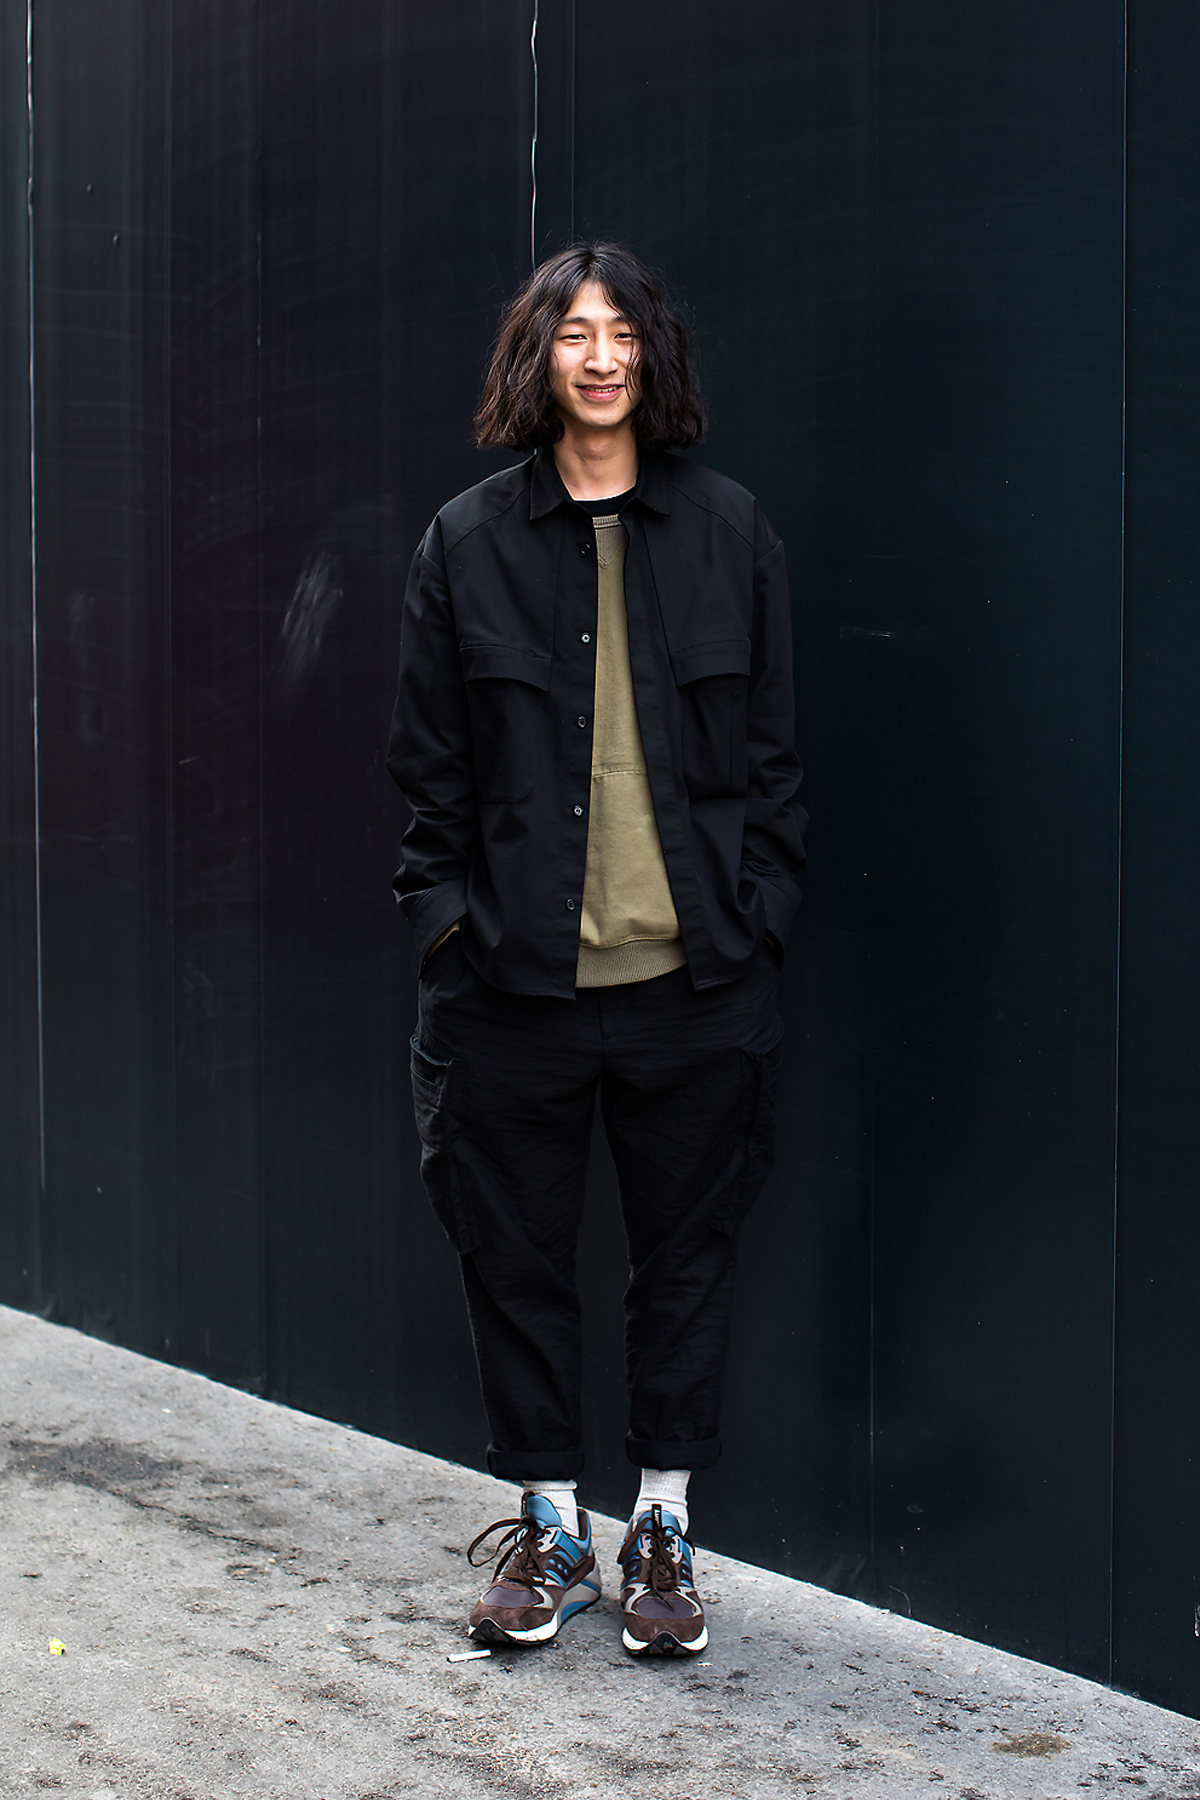 Jung Jaehoon, Street Fashion 2017 in SEOUL.jpg